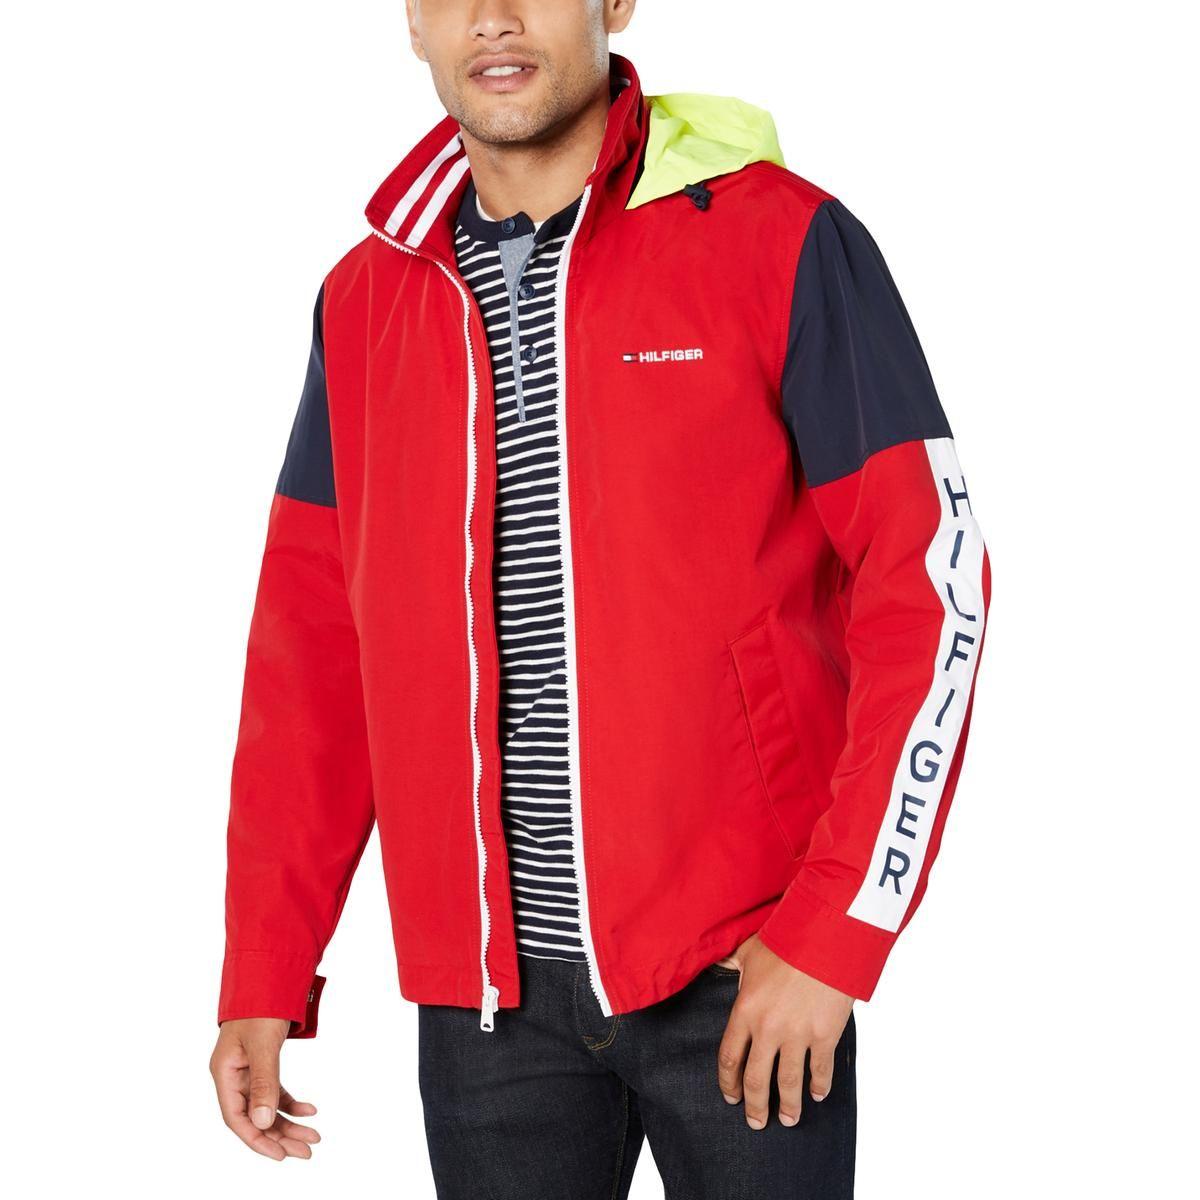 Tommy Hilfiger Mens Colorblock Winter Coat In 2021 Tommy Hilfiger Man Mens Sweatshirts Hoodie Mens Jackets [ 1200 x 1200 Pixel ]